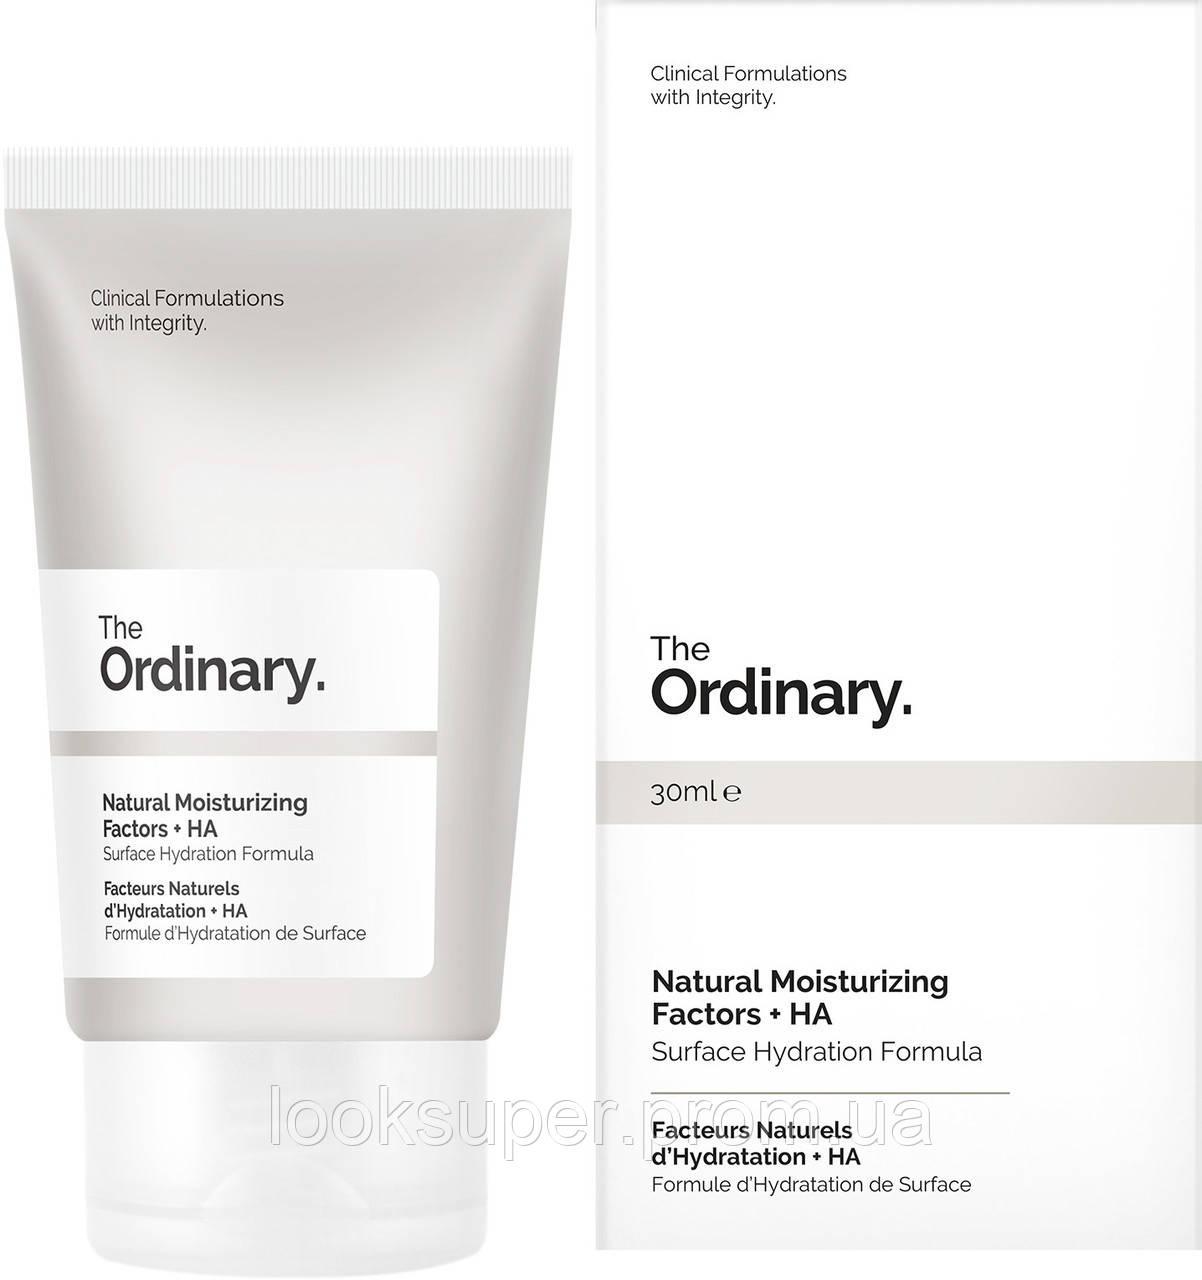 Крем для лица The Ordinary Natural Moisturizing Factors + HA( 30ml )